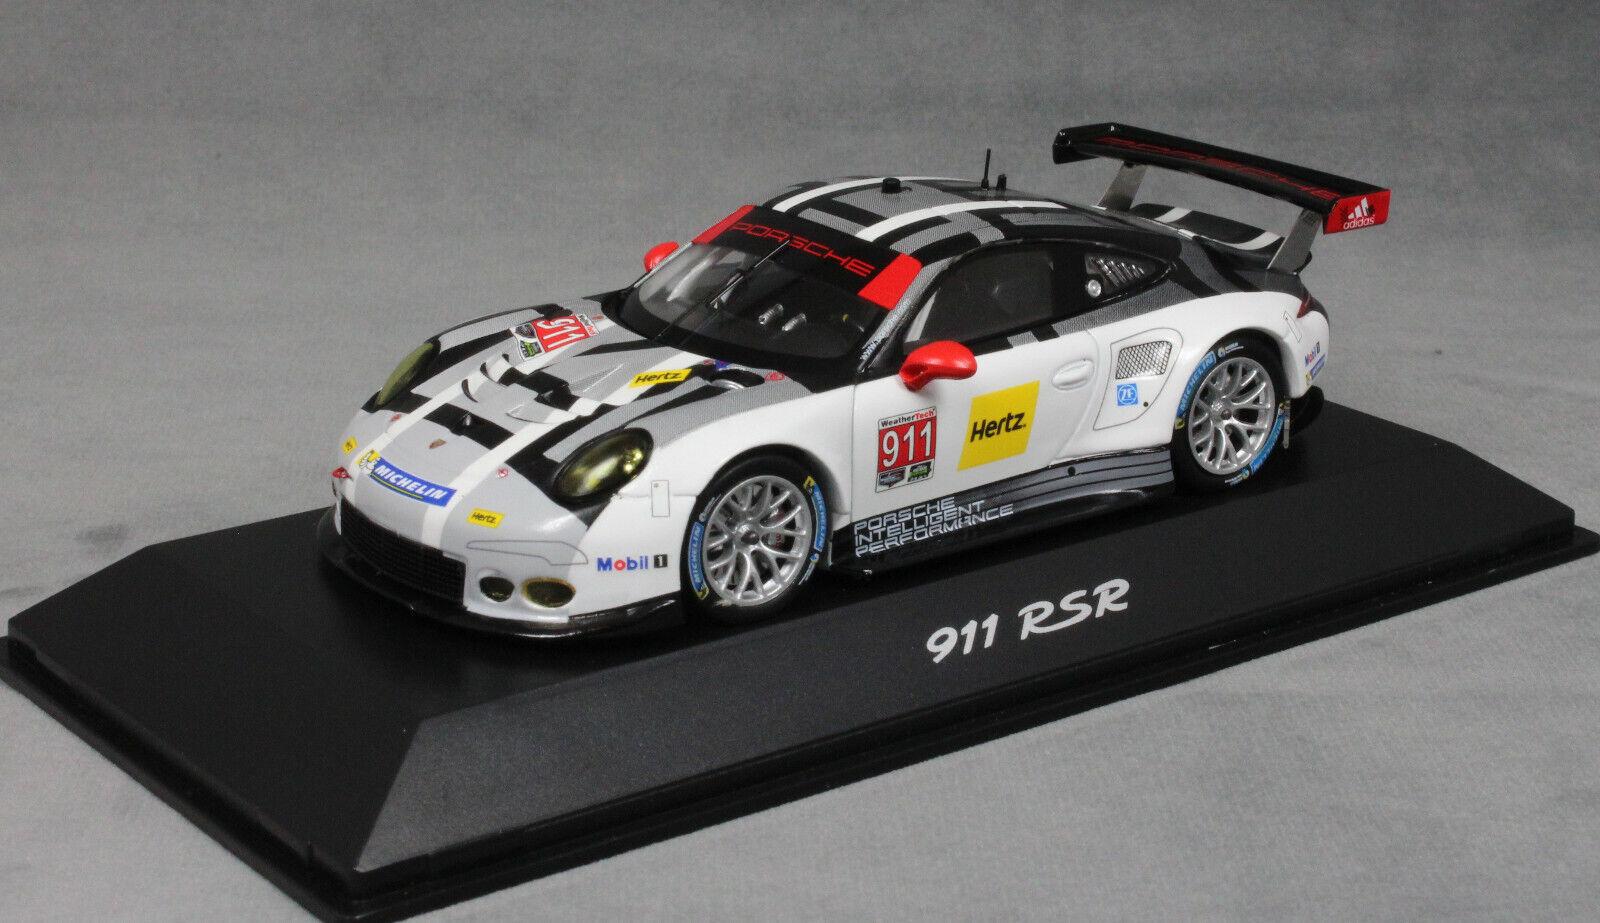 Spark Porsche 911 991 RSR RSR RSR Daytona 24H 2016 Estre Tandy Pilet WAP0201480H 1 43NEW 794092